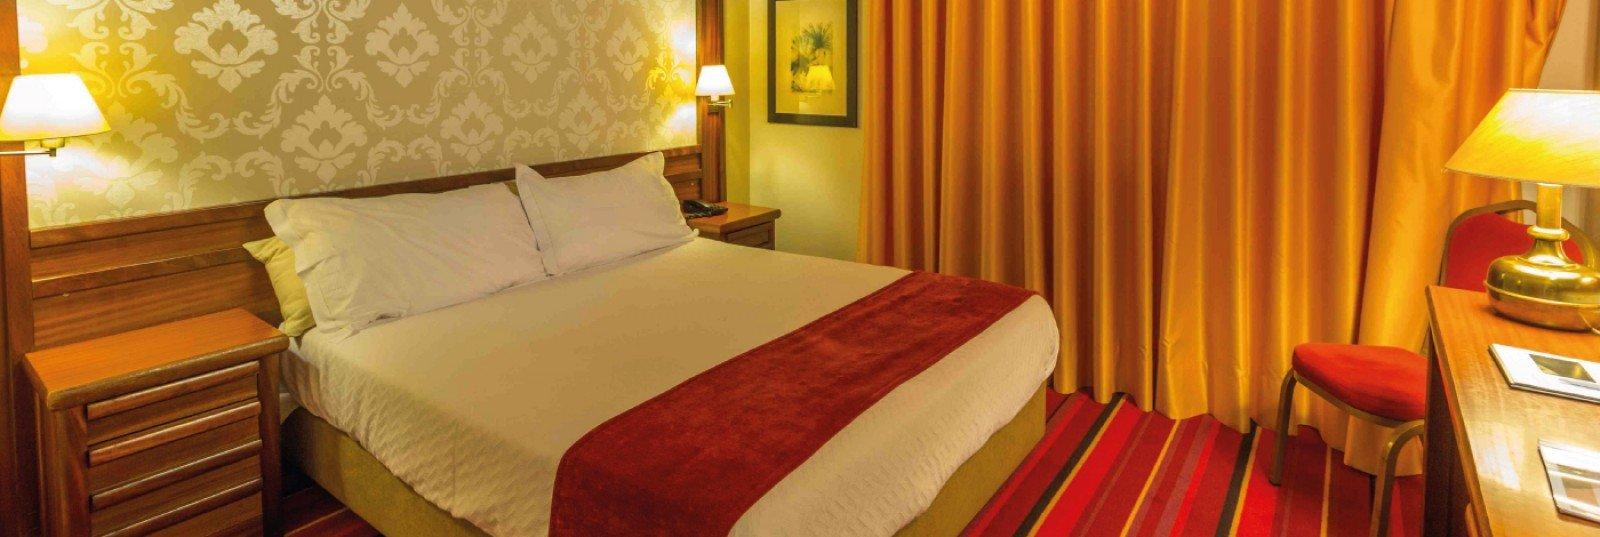 Hotel Eurosol Seia Camelo - double superior room